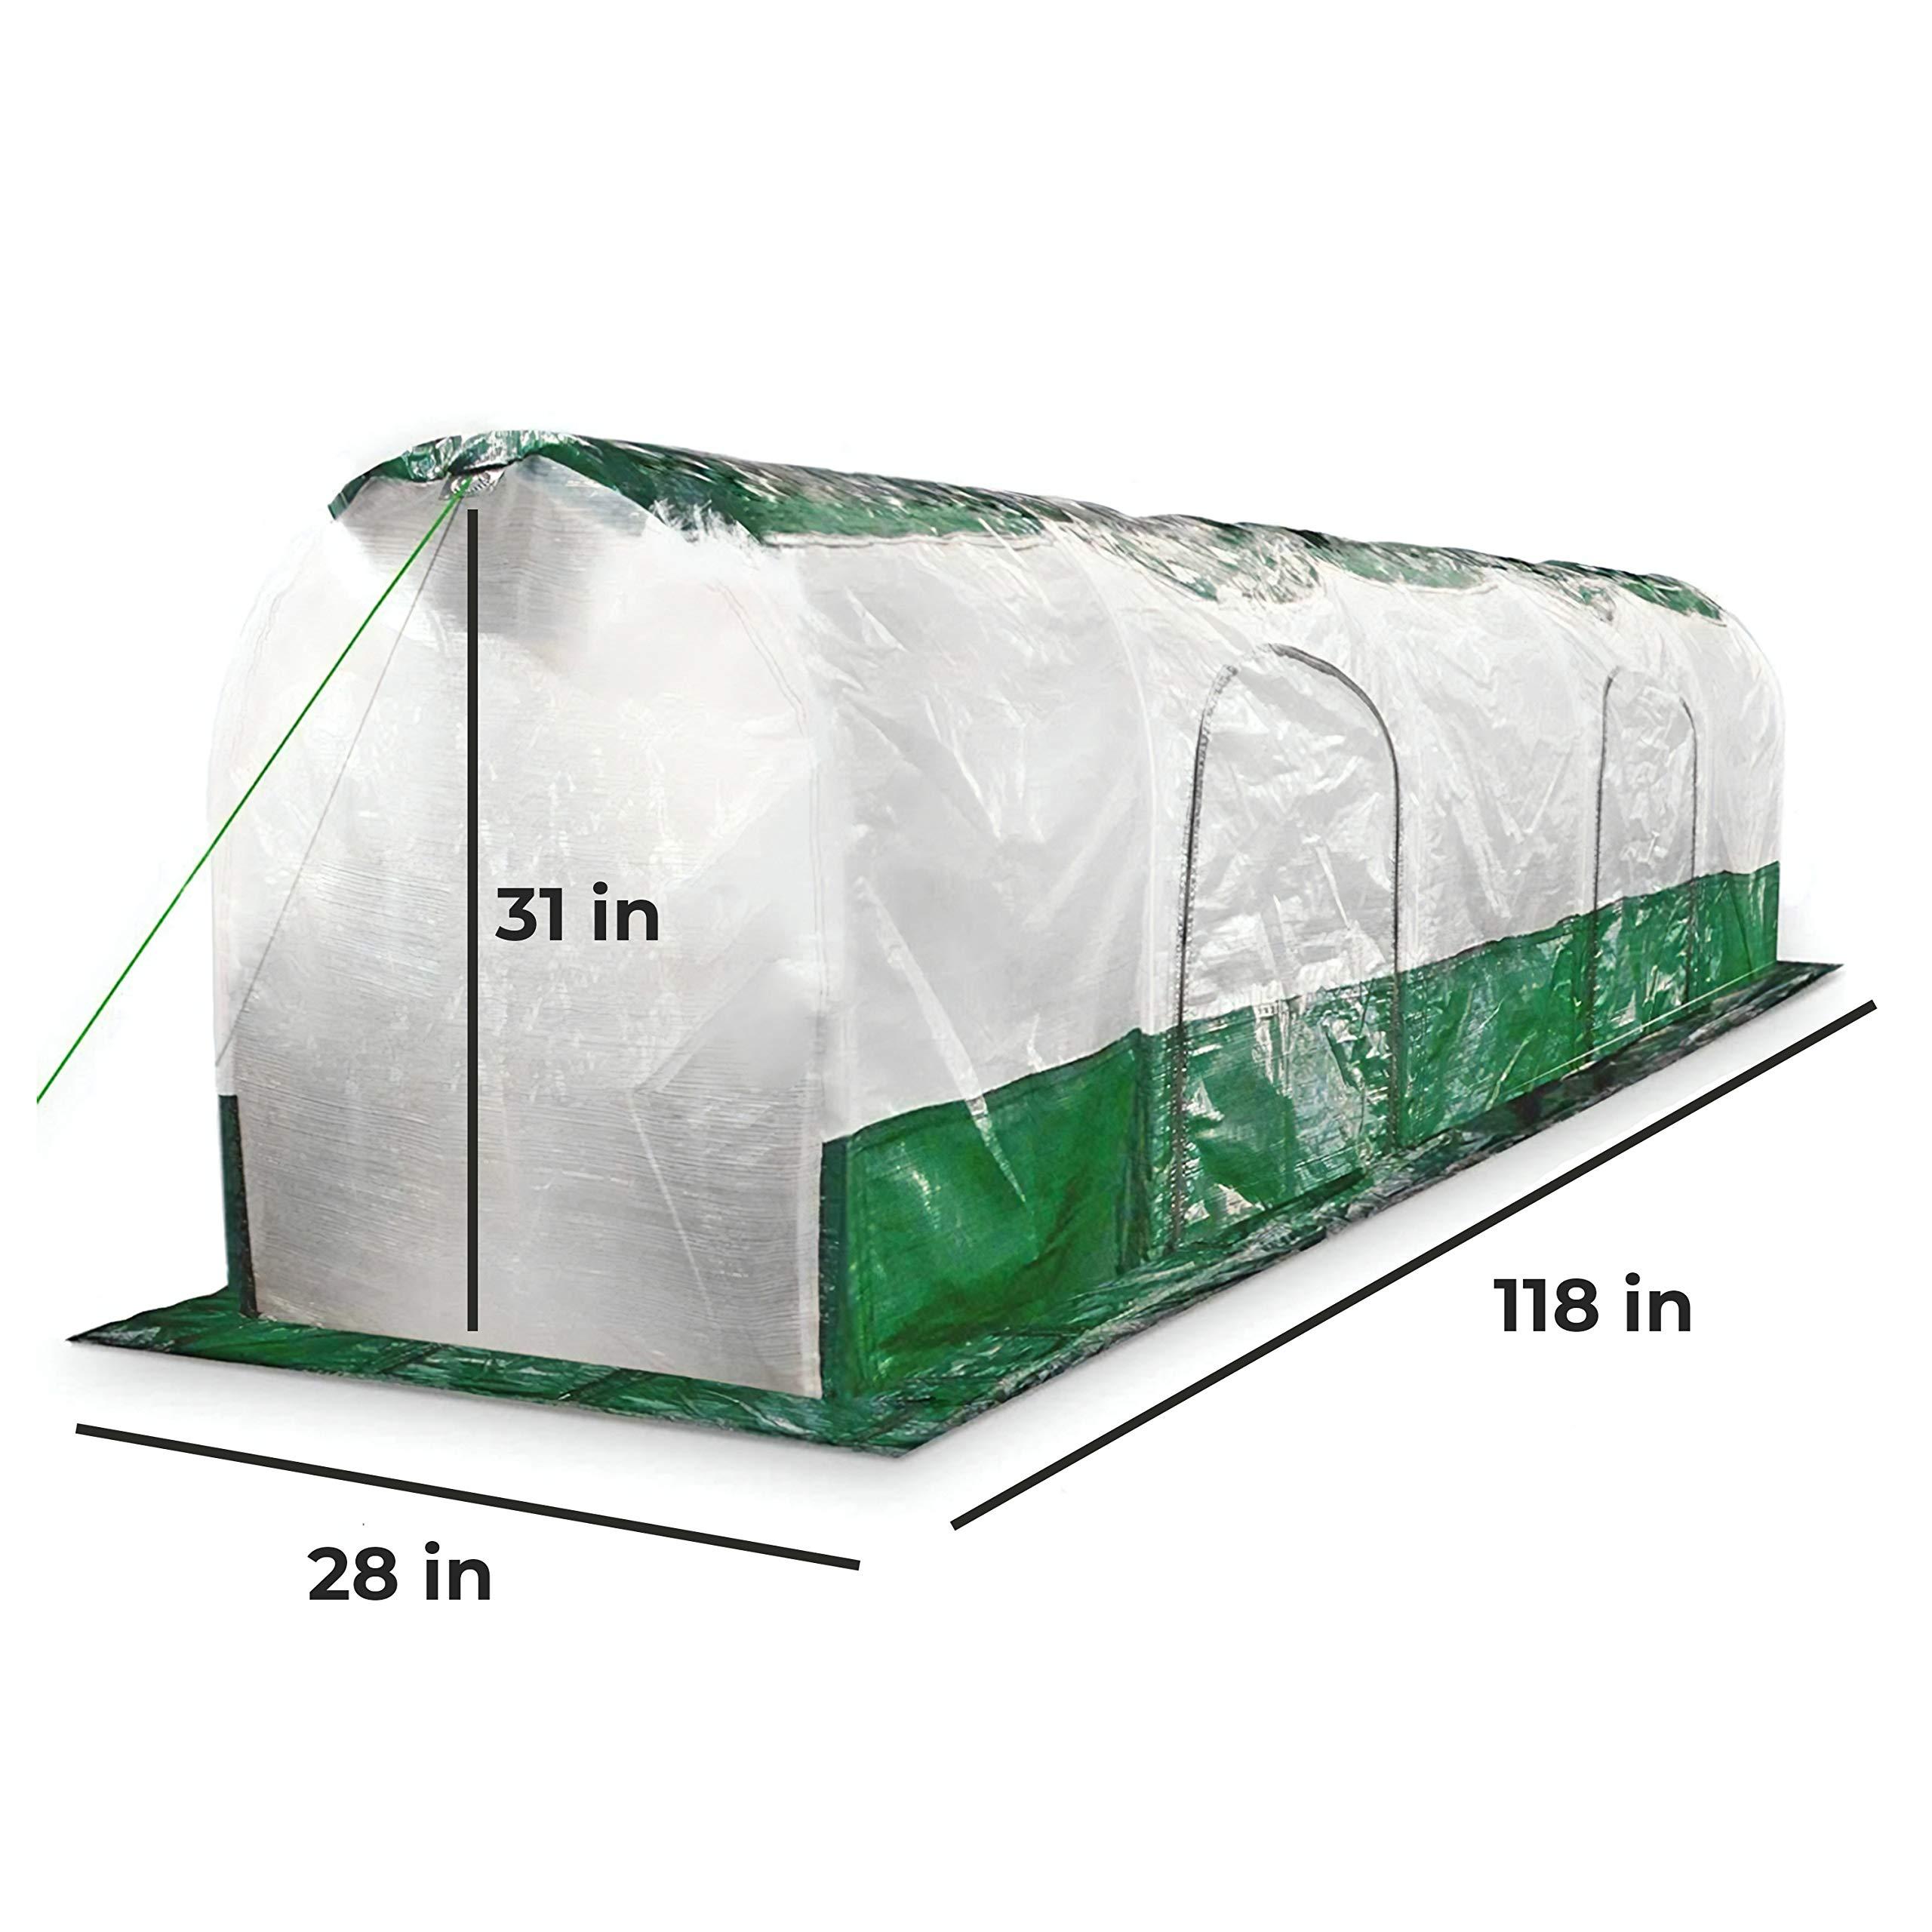 Bio Green SD300 Superdome Growtunnel, Garden Cl Length 9.8 x Width 2.3 ft, 2.6 x 2.3X 9.8', Transparent/Green by Bio Green (Image #1)